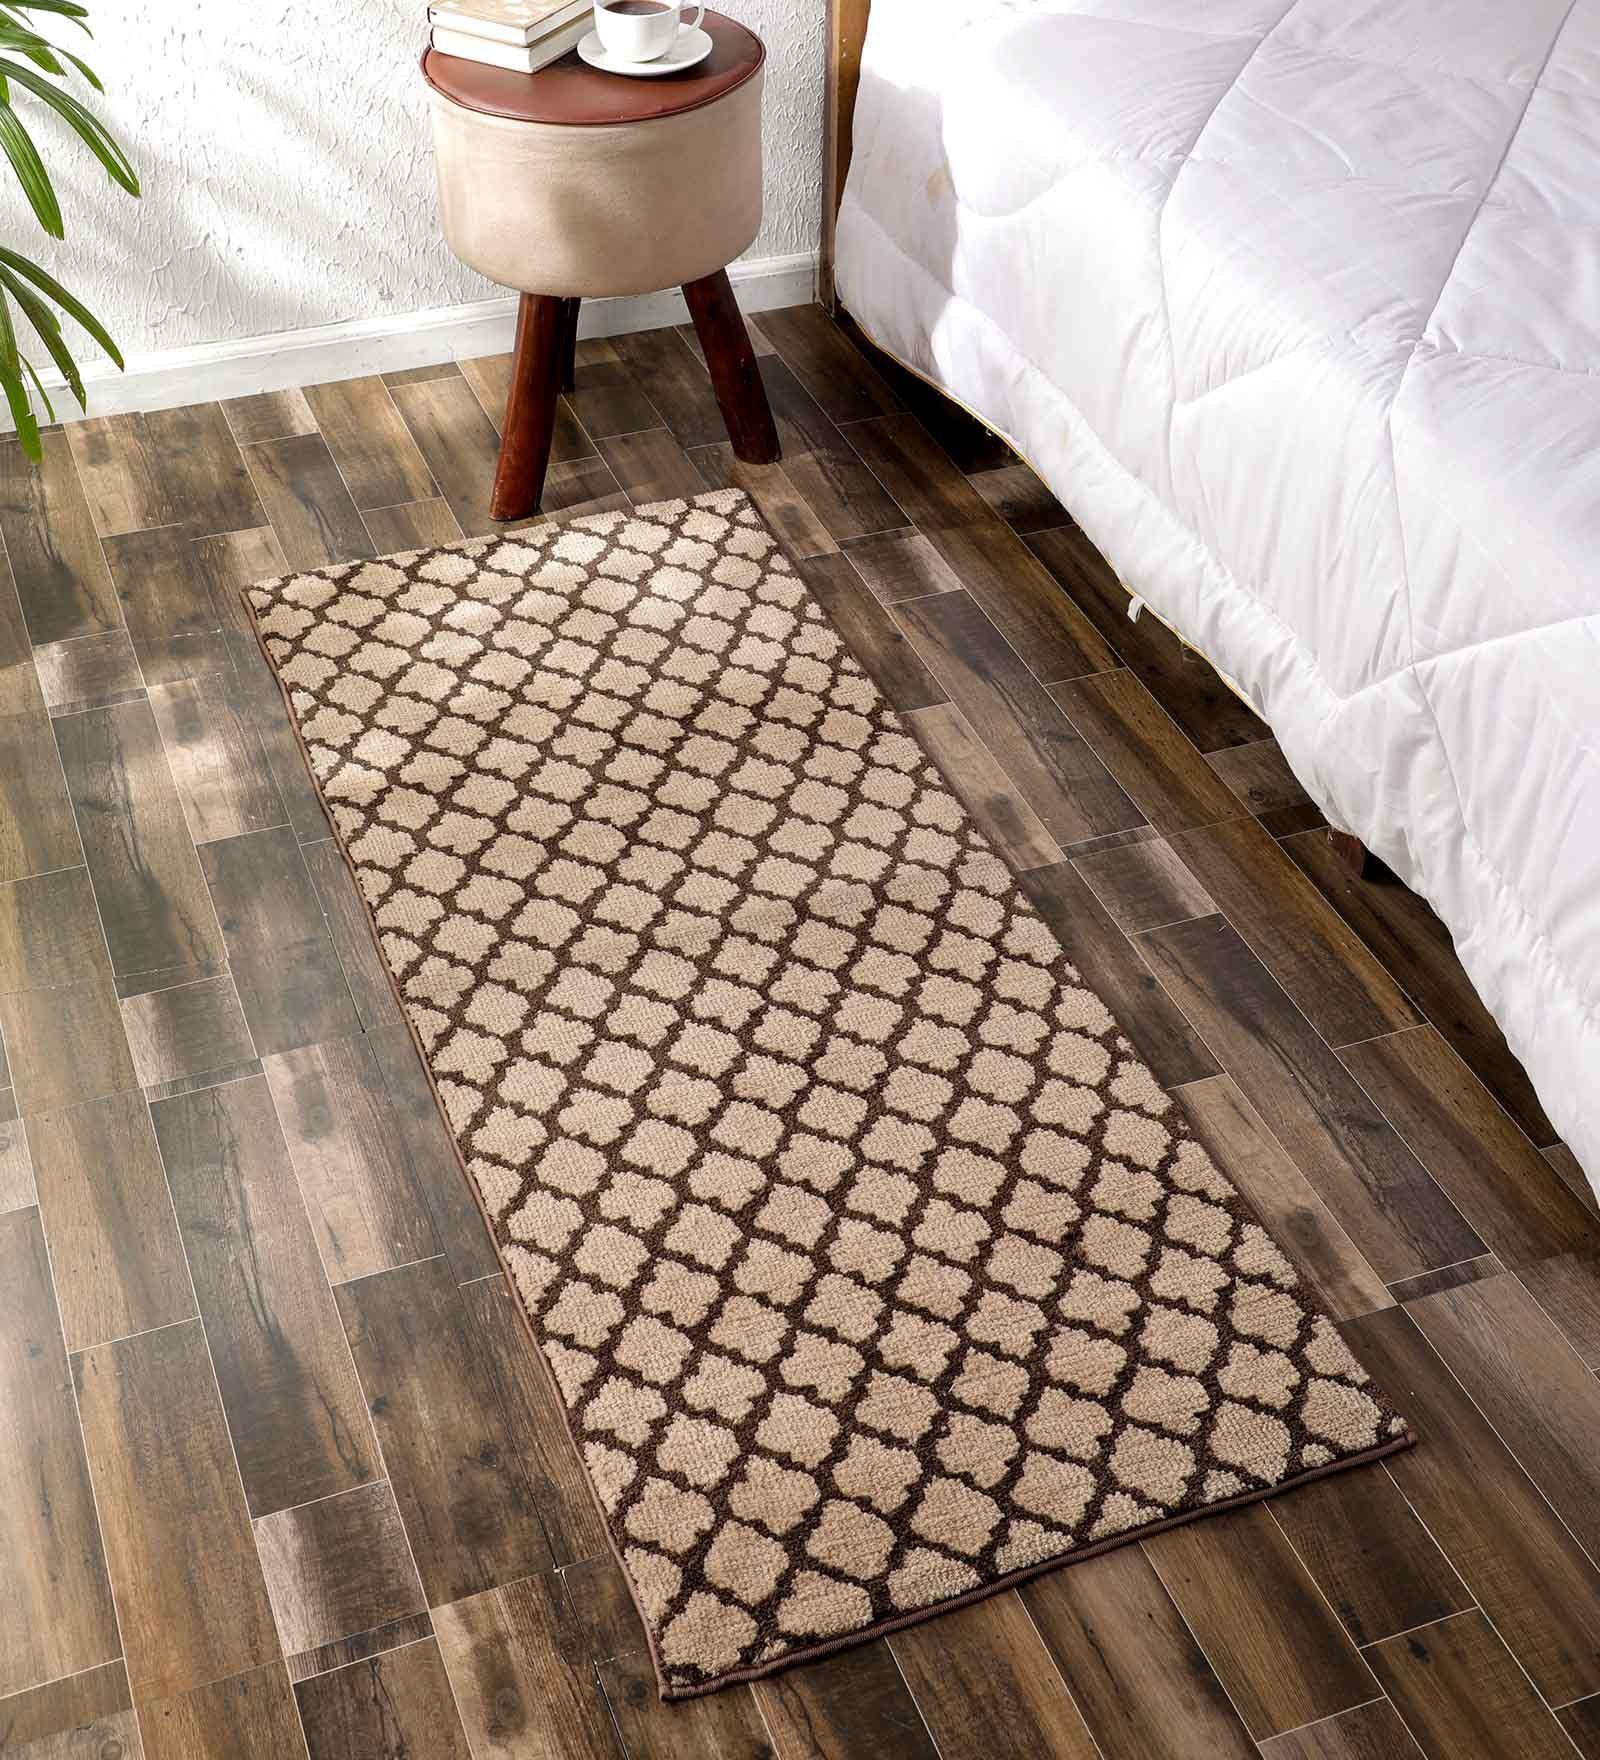 Flooring India Light Beige & Coffee Polyester Jewel Helix 24x60 Inch Anti Skit Runner